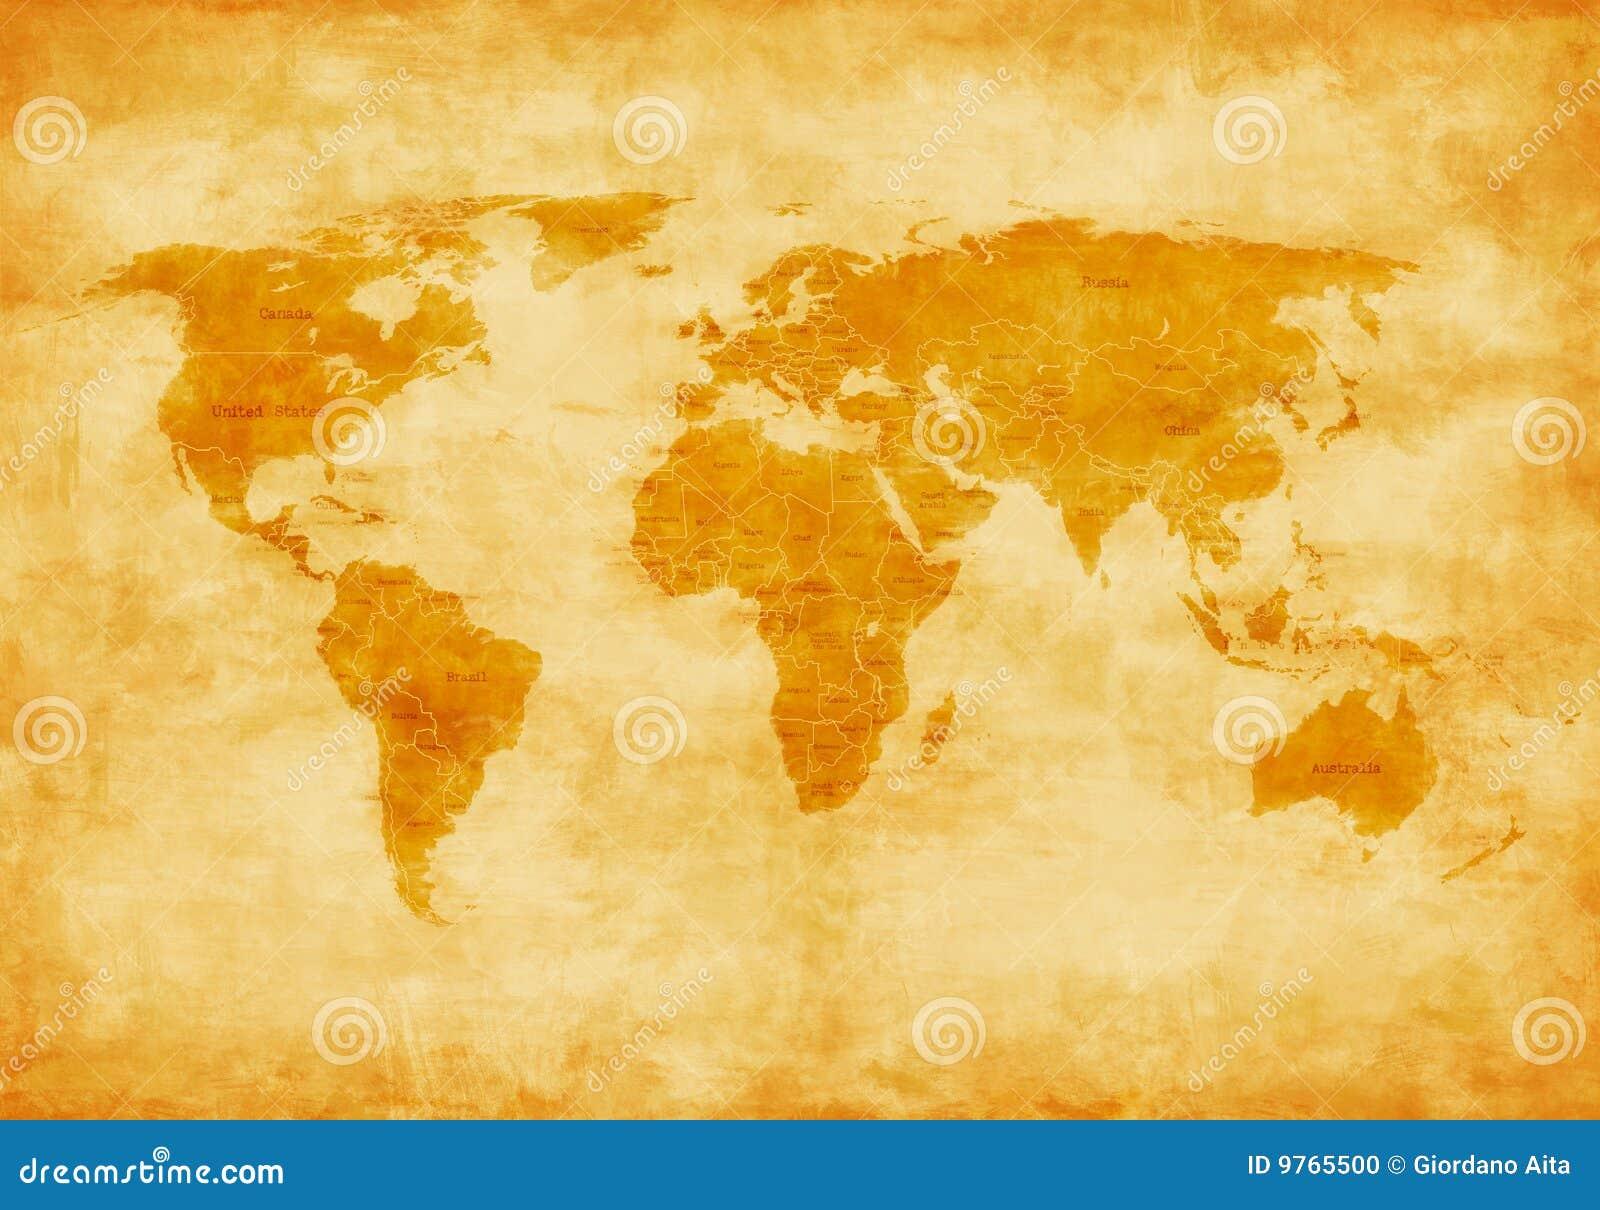 Old style world map stock illustration illustration of route 9765500 old style world map gumiabroncs Images